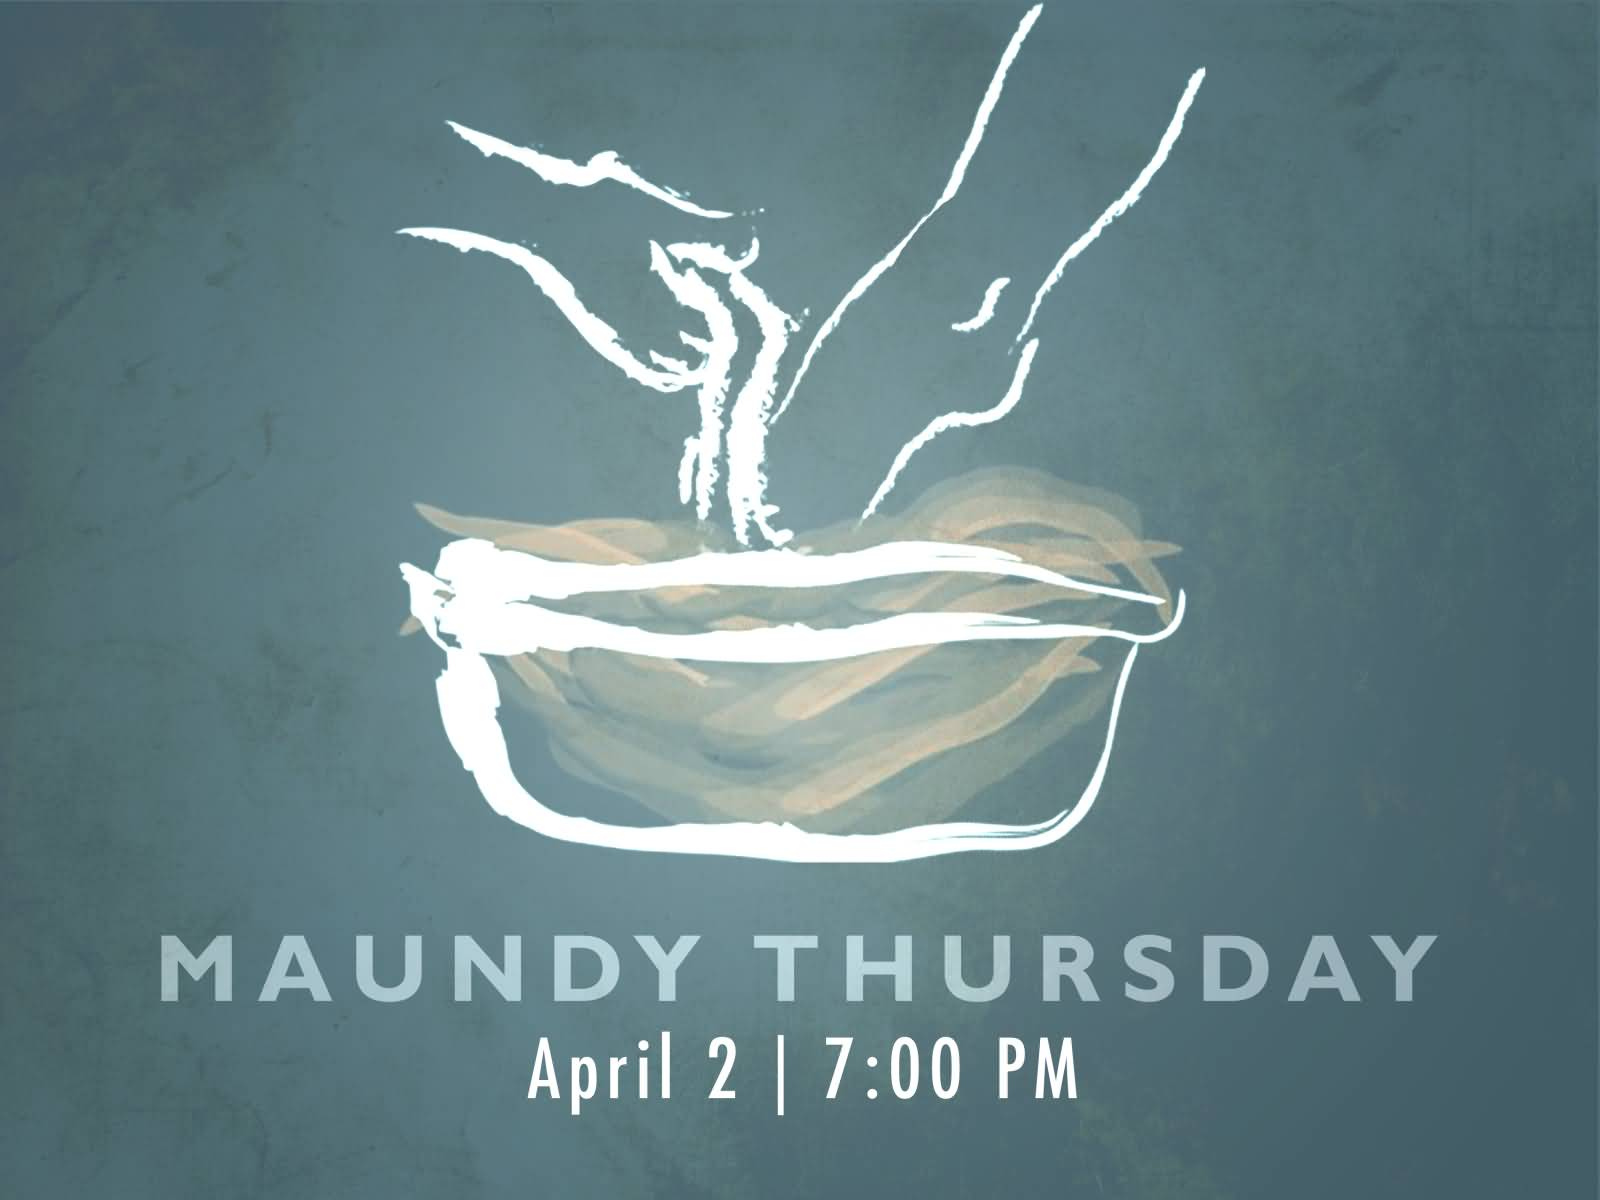 Maundy Thursday Images 01908